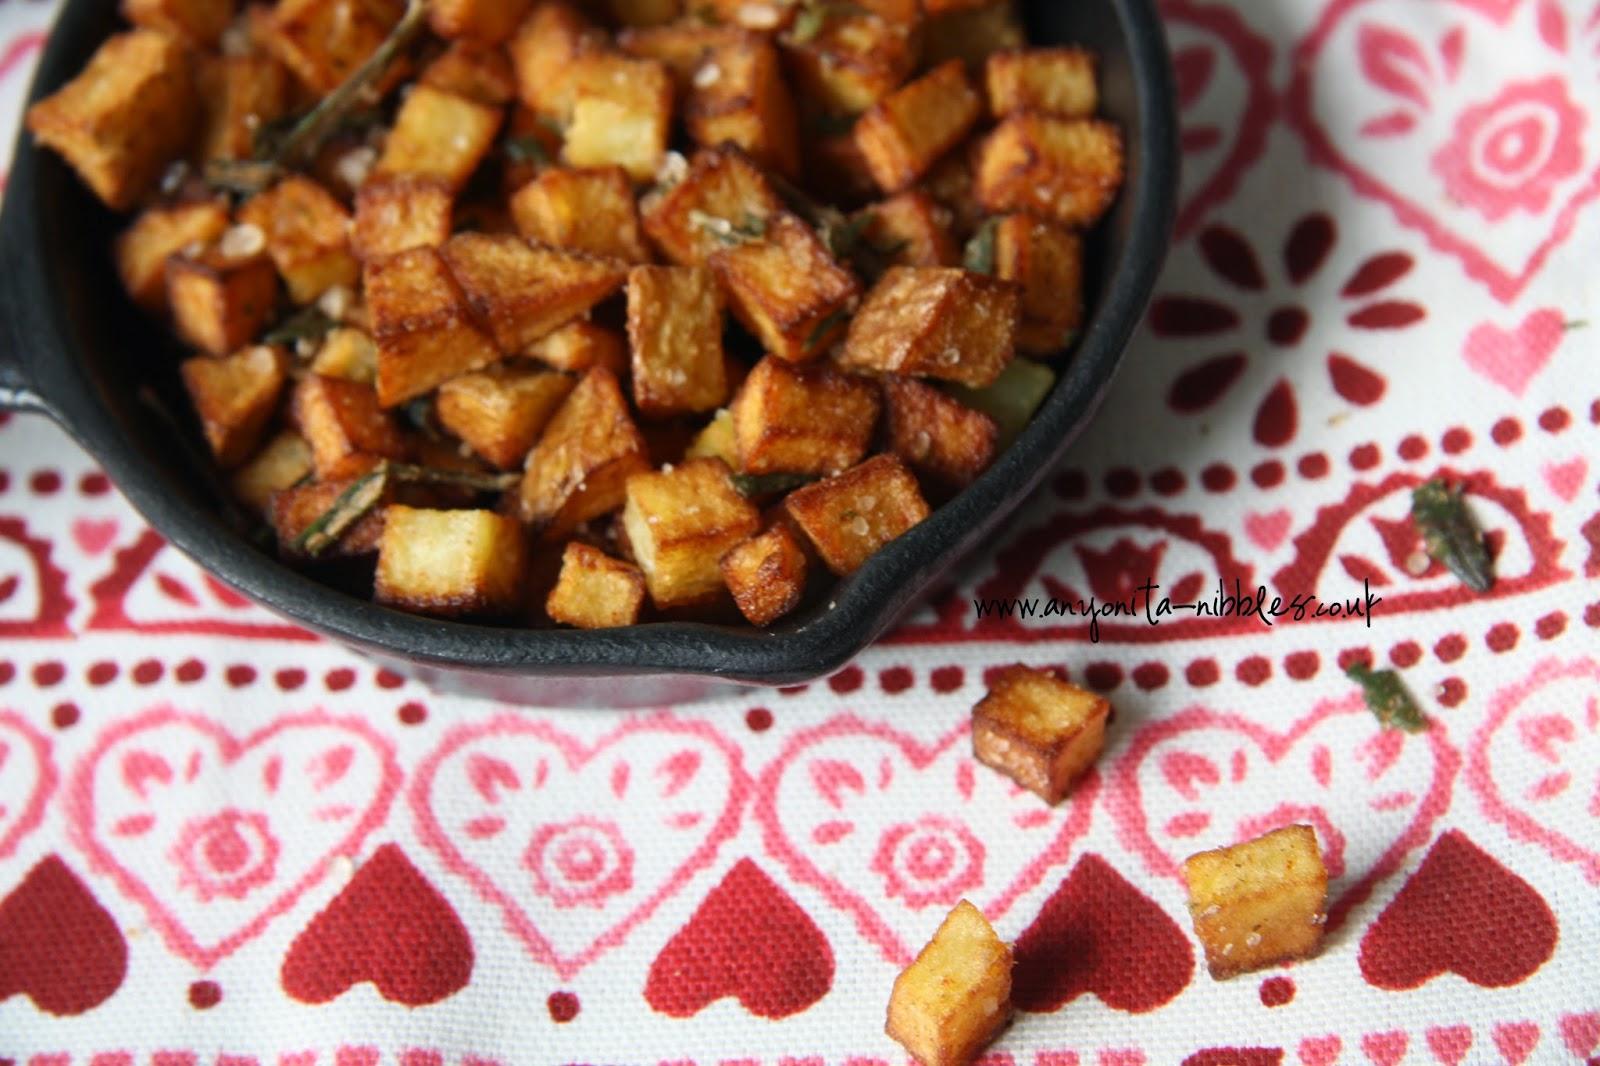 Diced pan fried breakfast #potatoes from www.anyonita-nibbles.co.uk #glutenfree #vegan